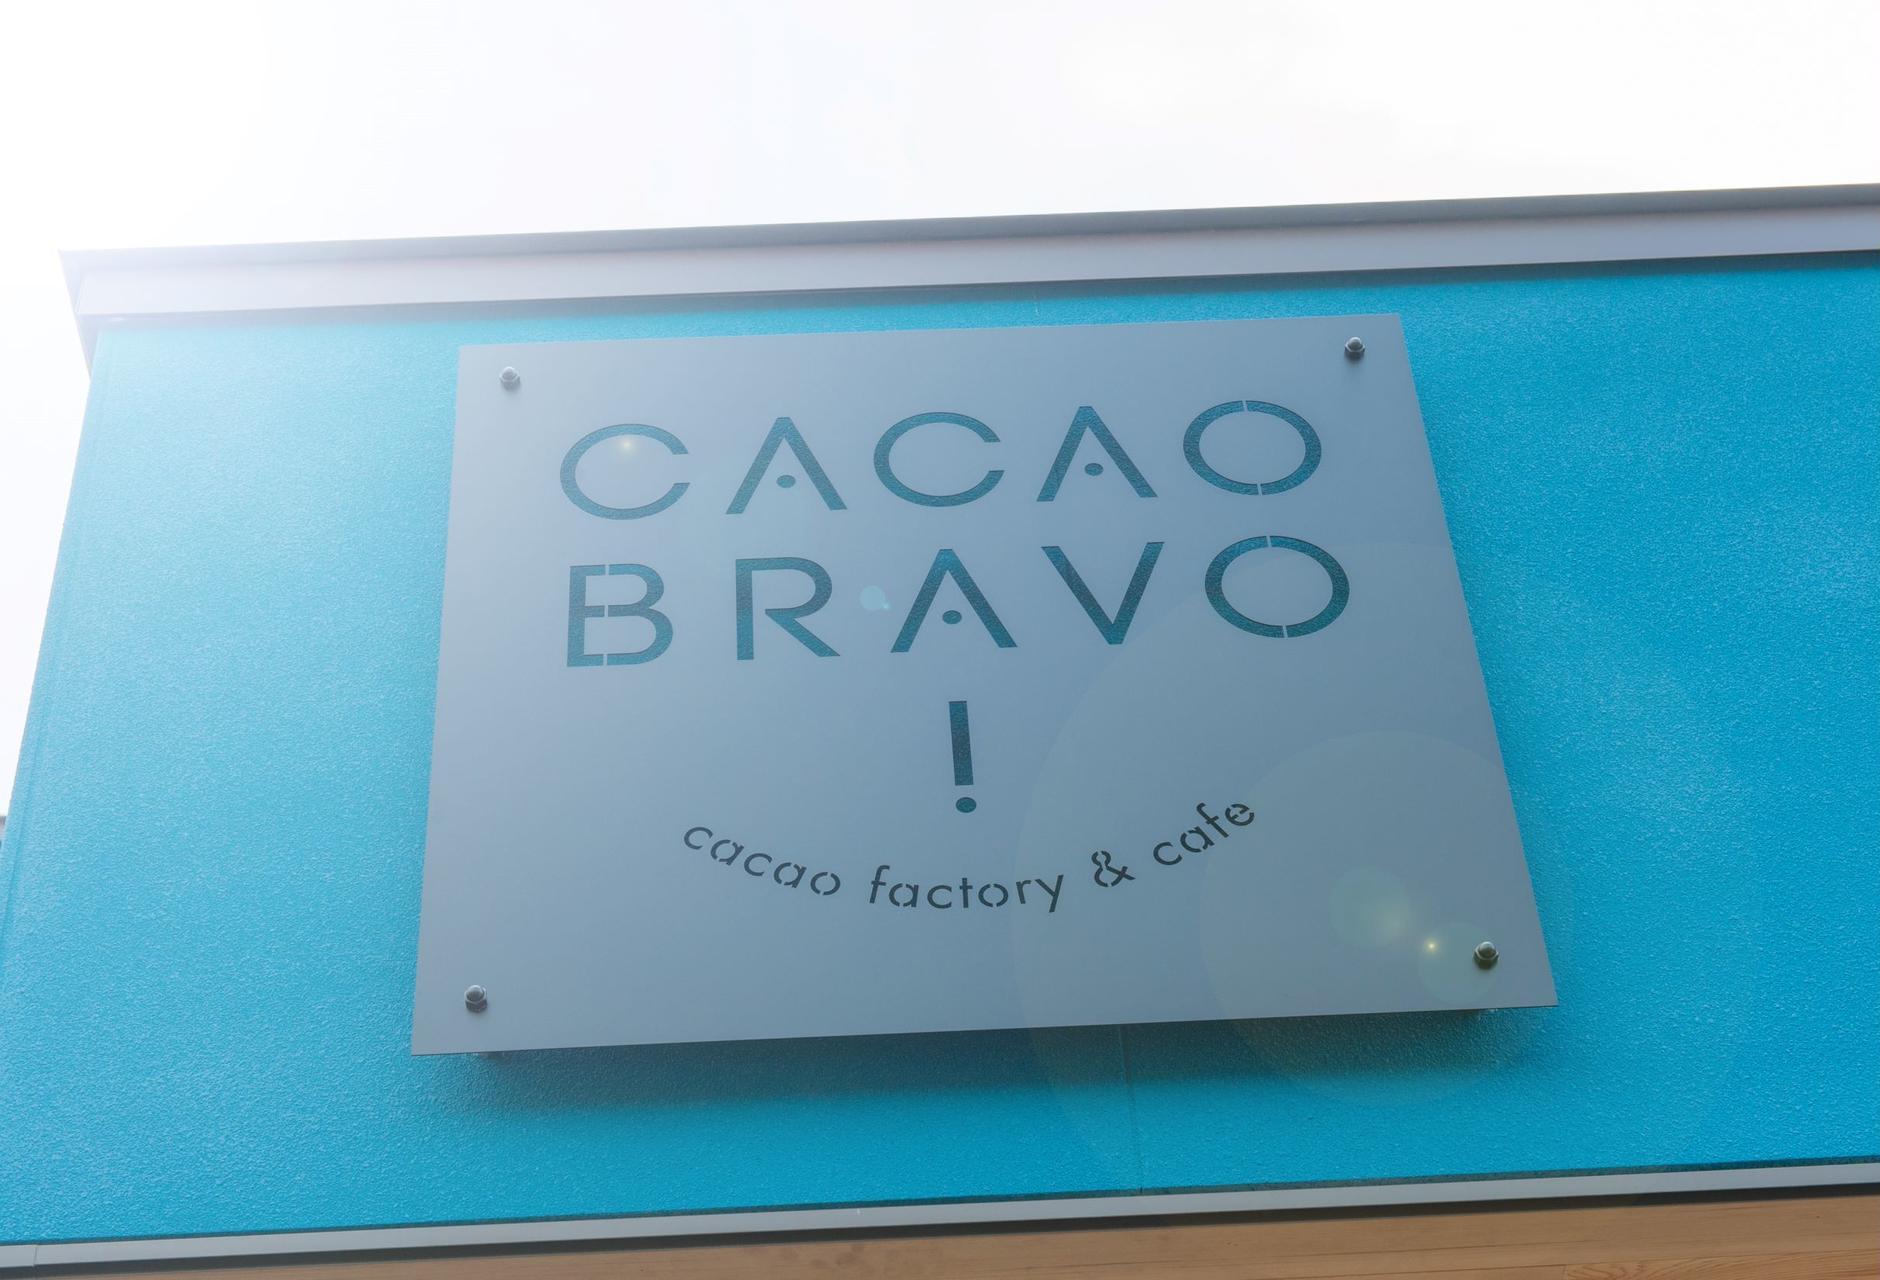 CACAO BRAVO!